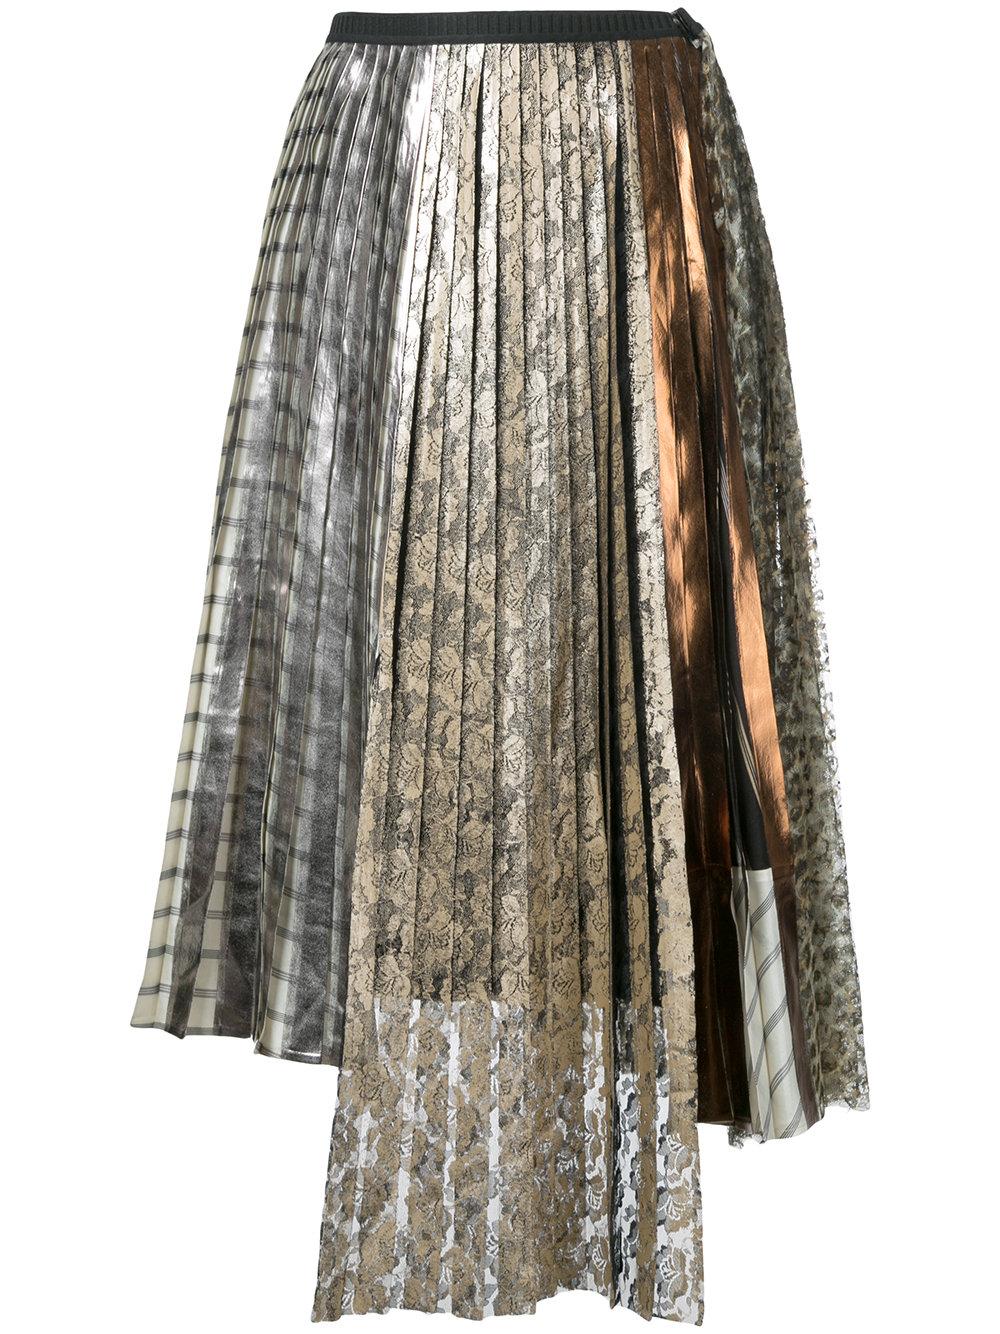 antonio marras lace pleated skirt fashion style fan